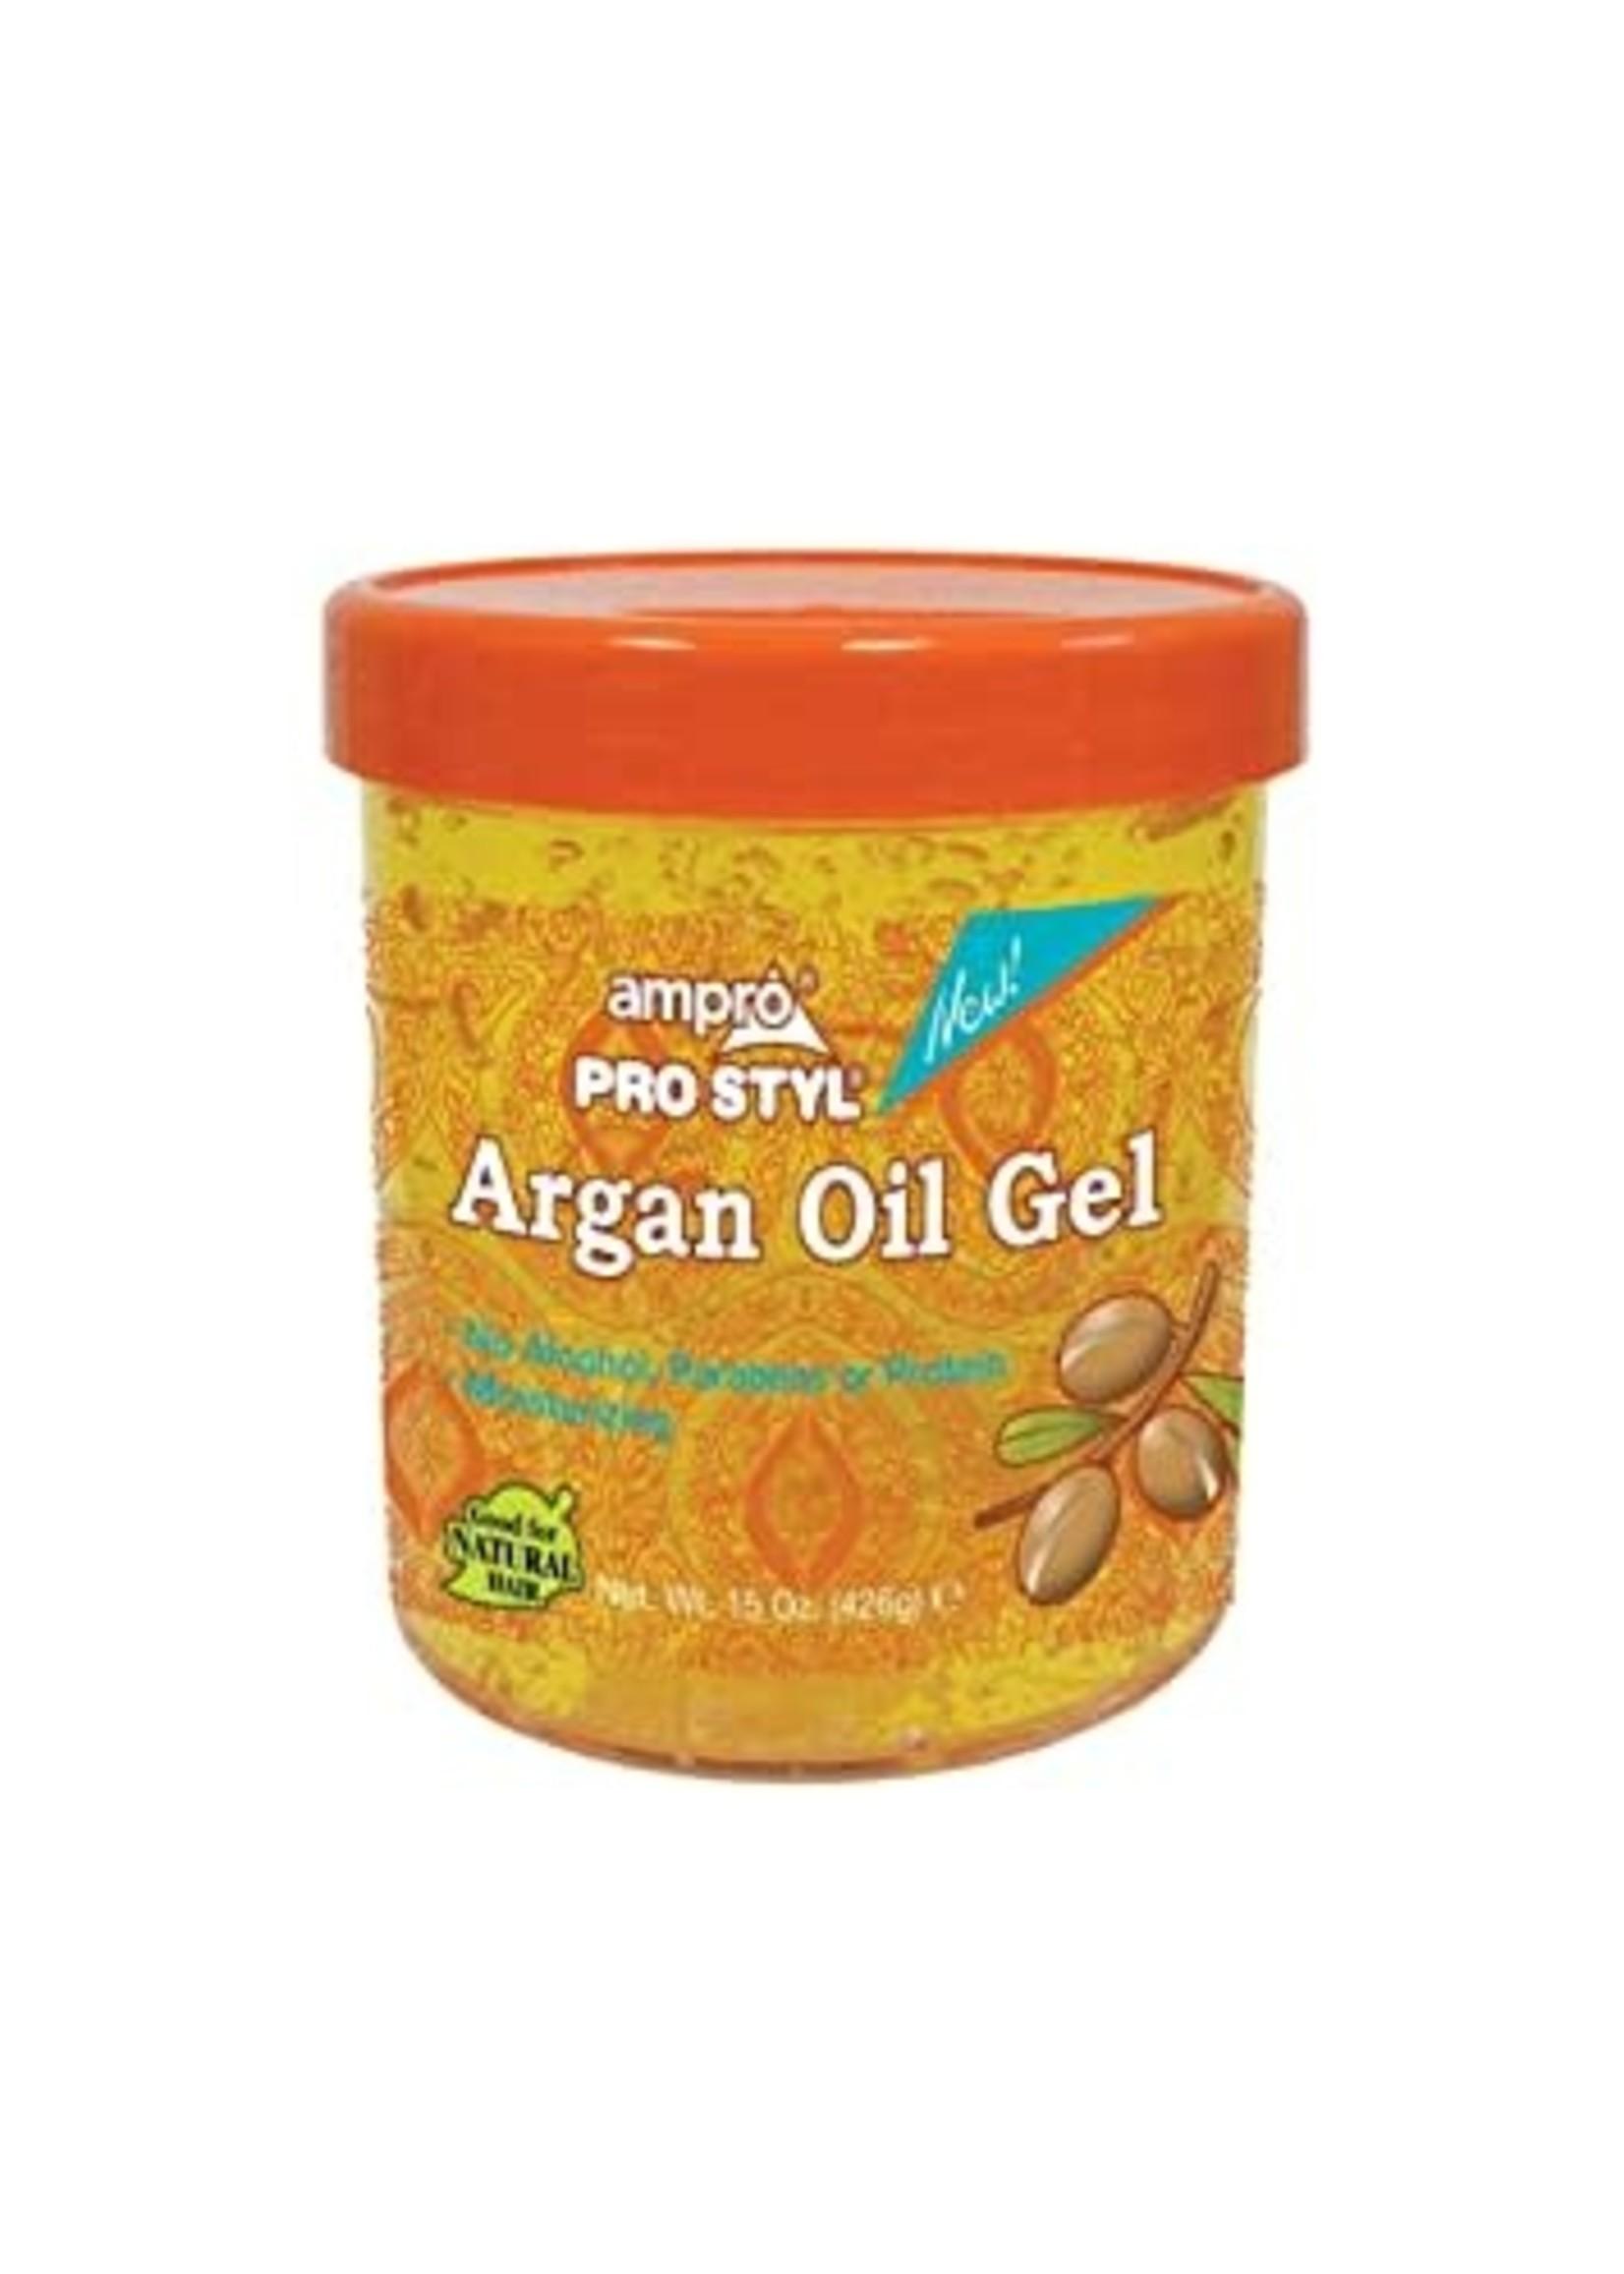 Ampro Argan Oil Gel 15oz